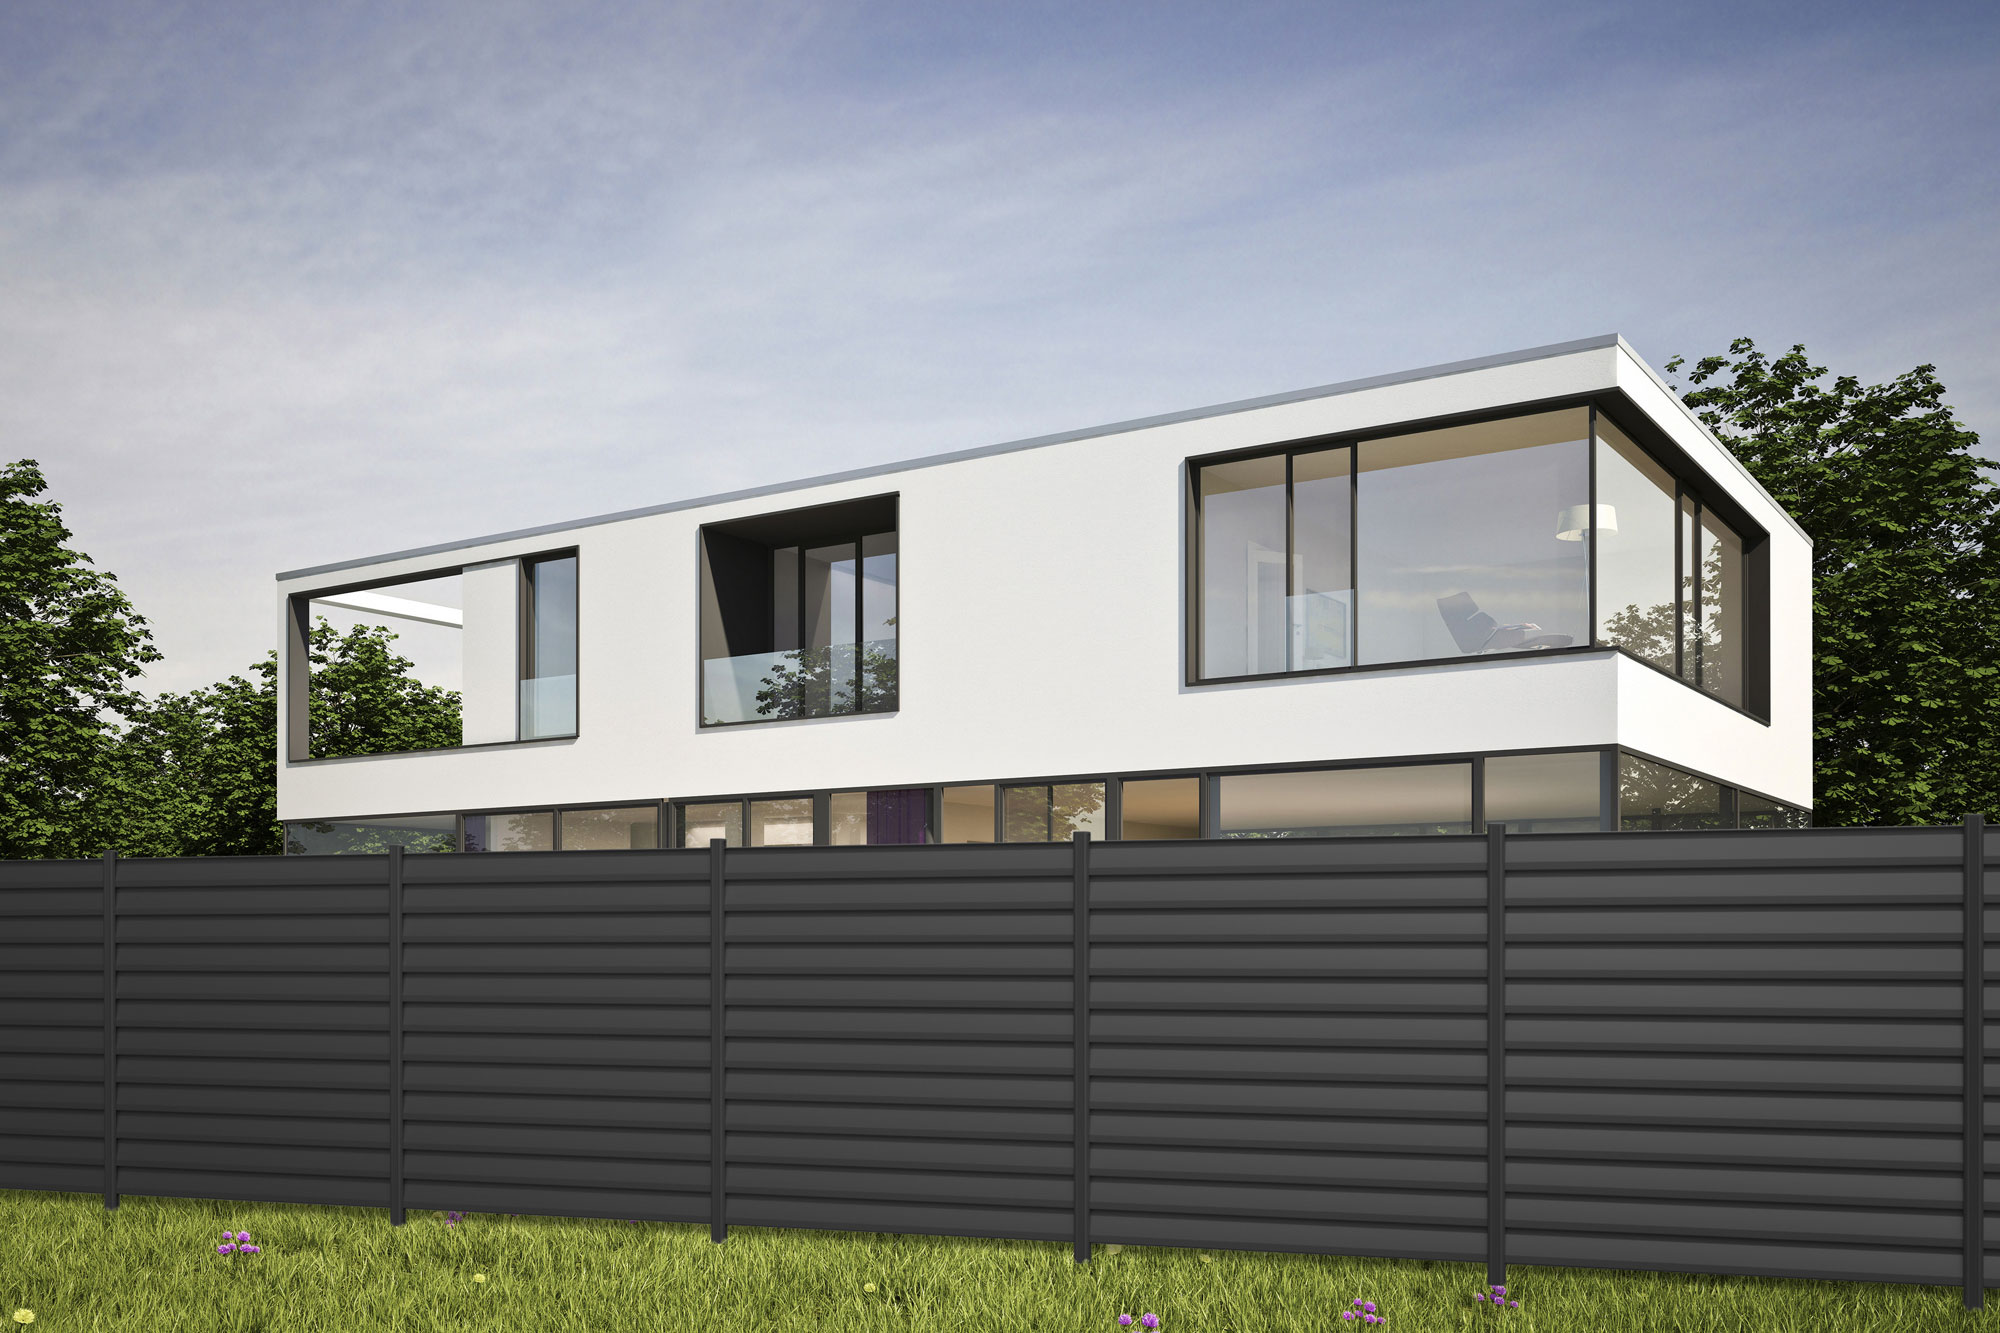 sichtschutzzaun system metall basic zaunfeld set anthrazit b179xh180cm bei. Black Bedroom Furniture Sets. Home Design Ideas